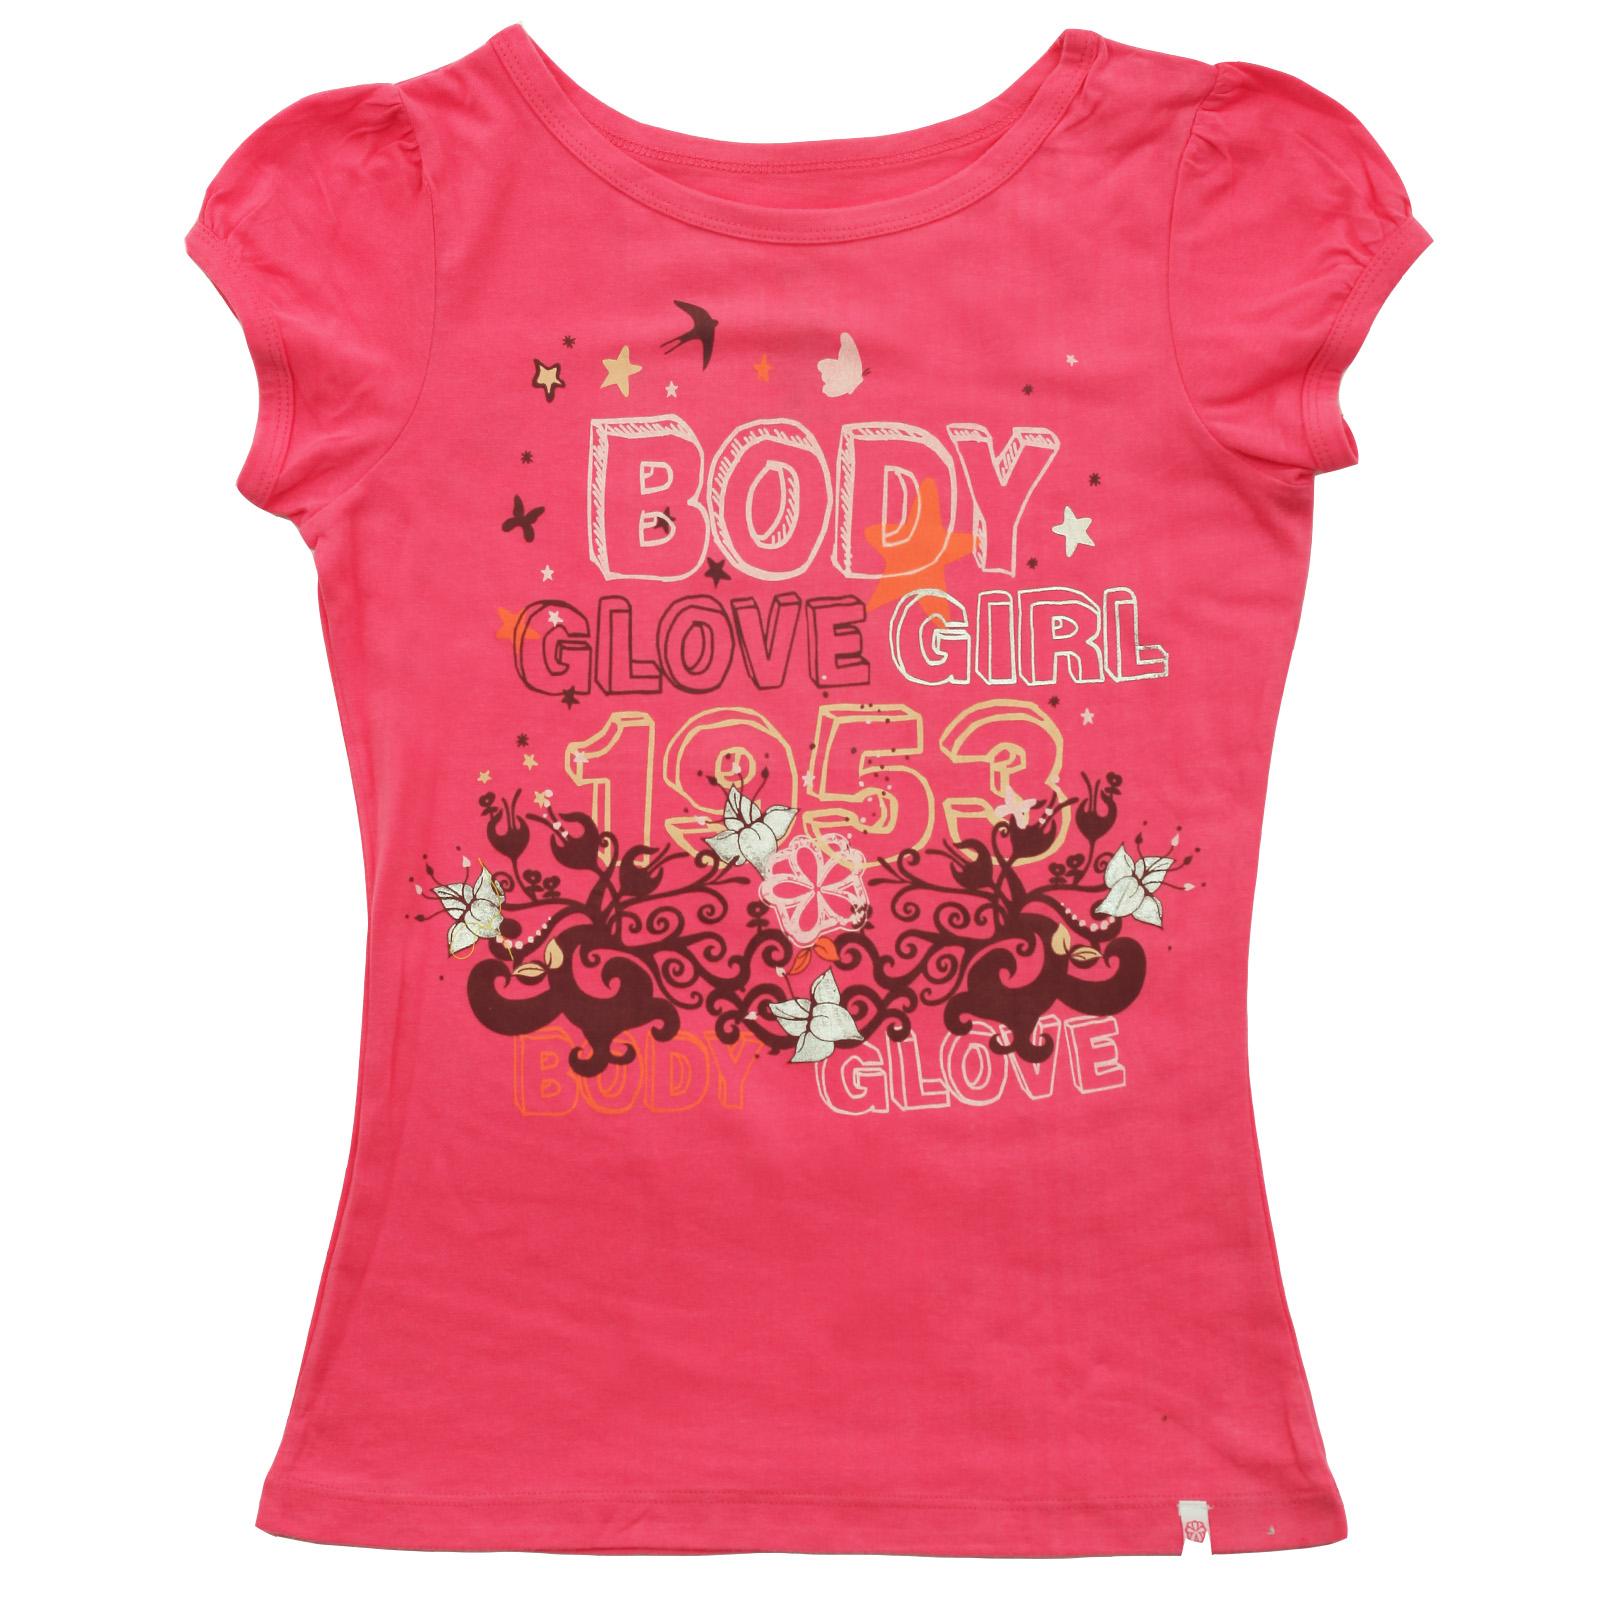 Стильная футболка для девушки от бренда Body Glove®